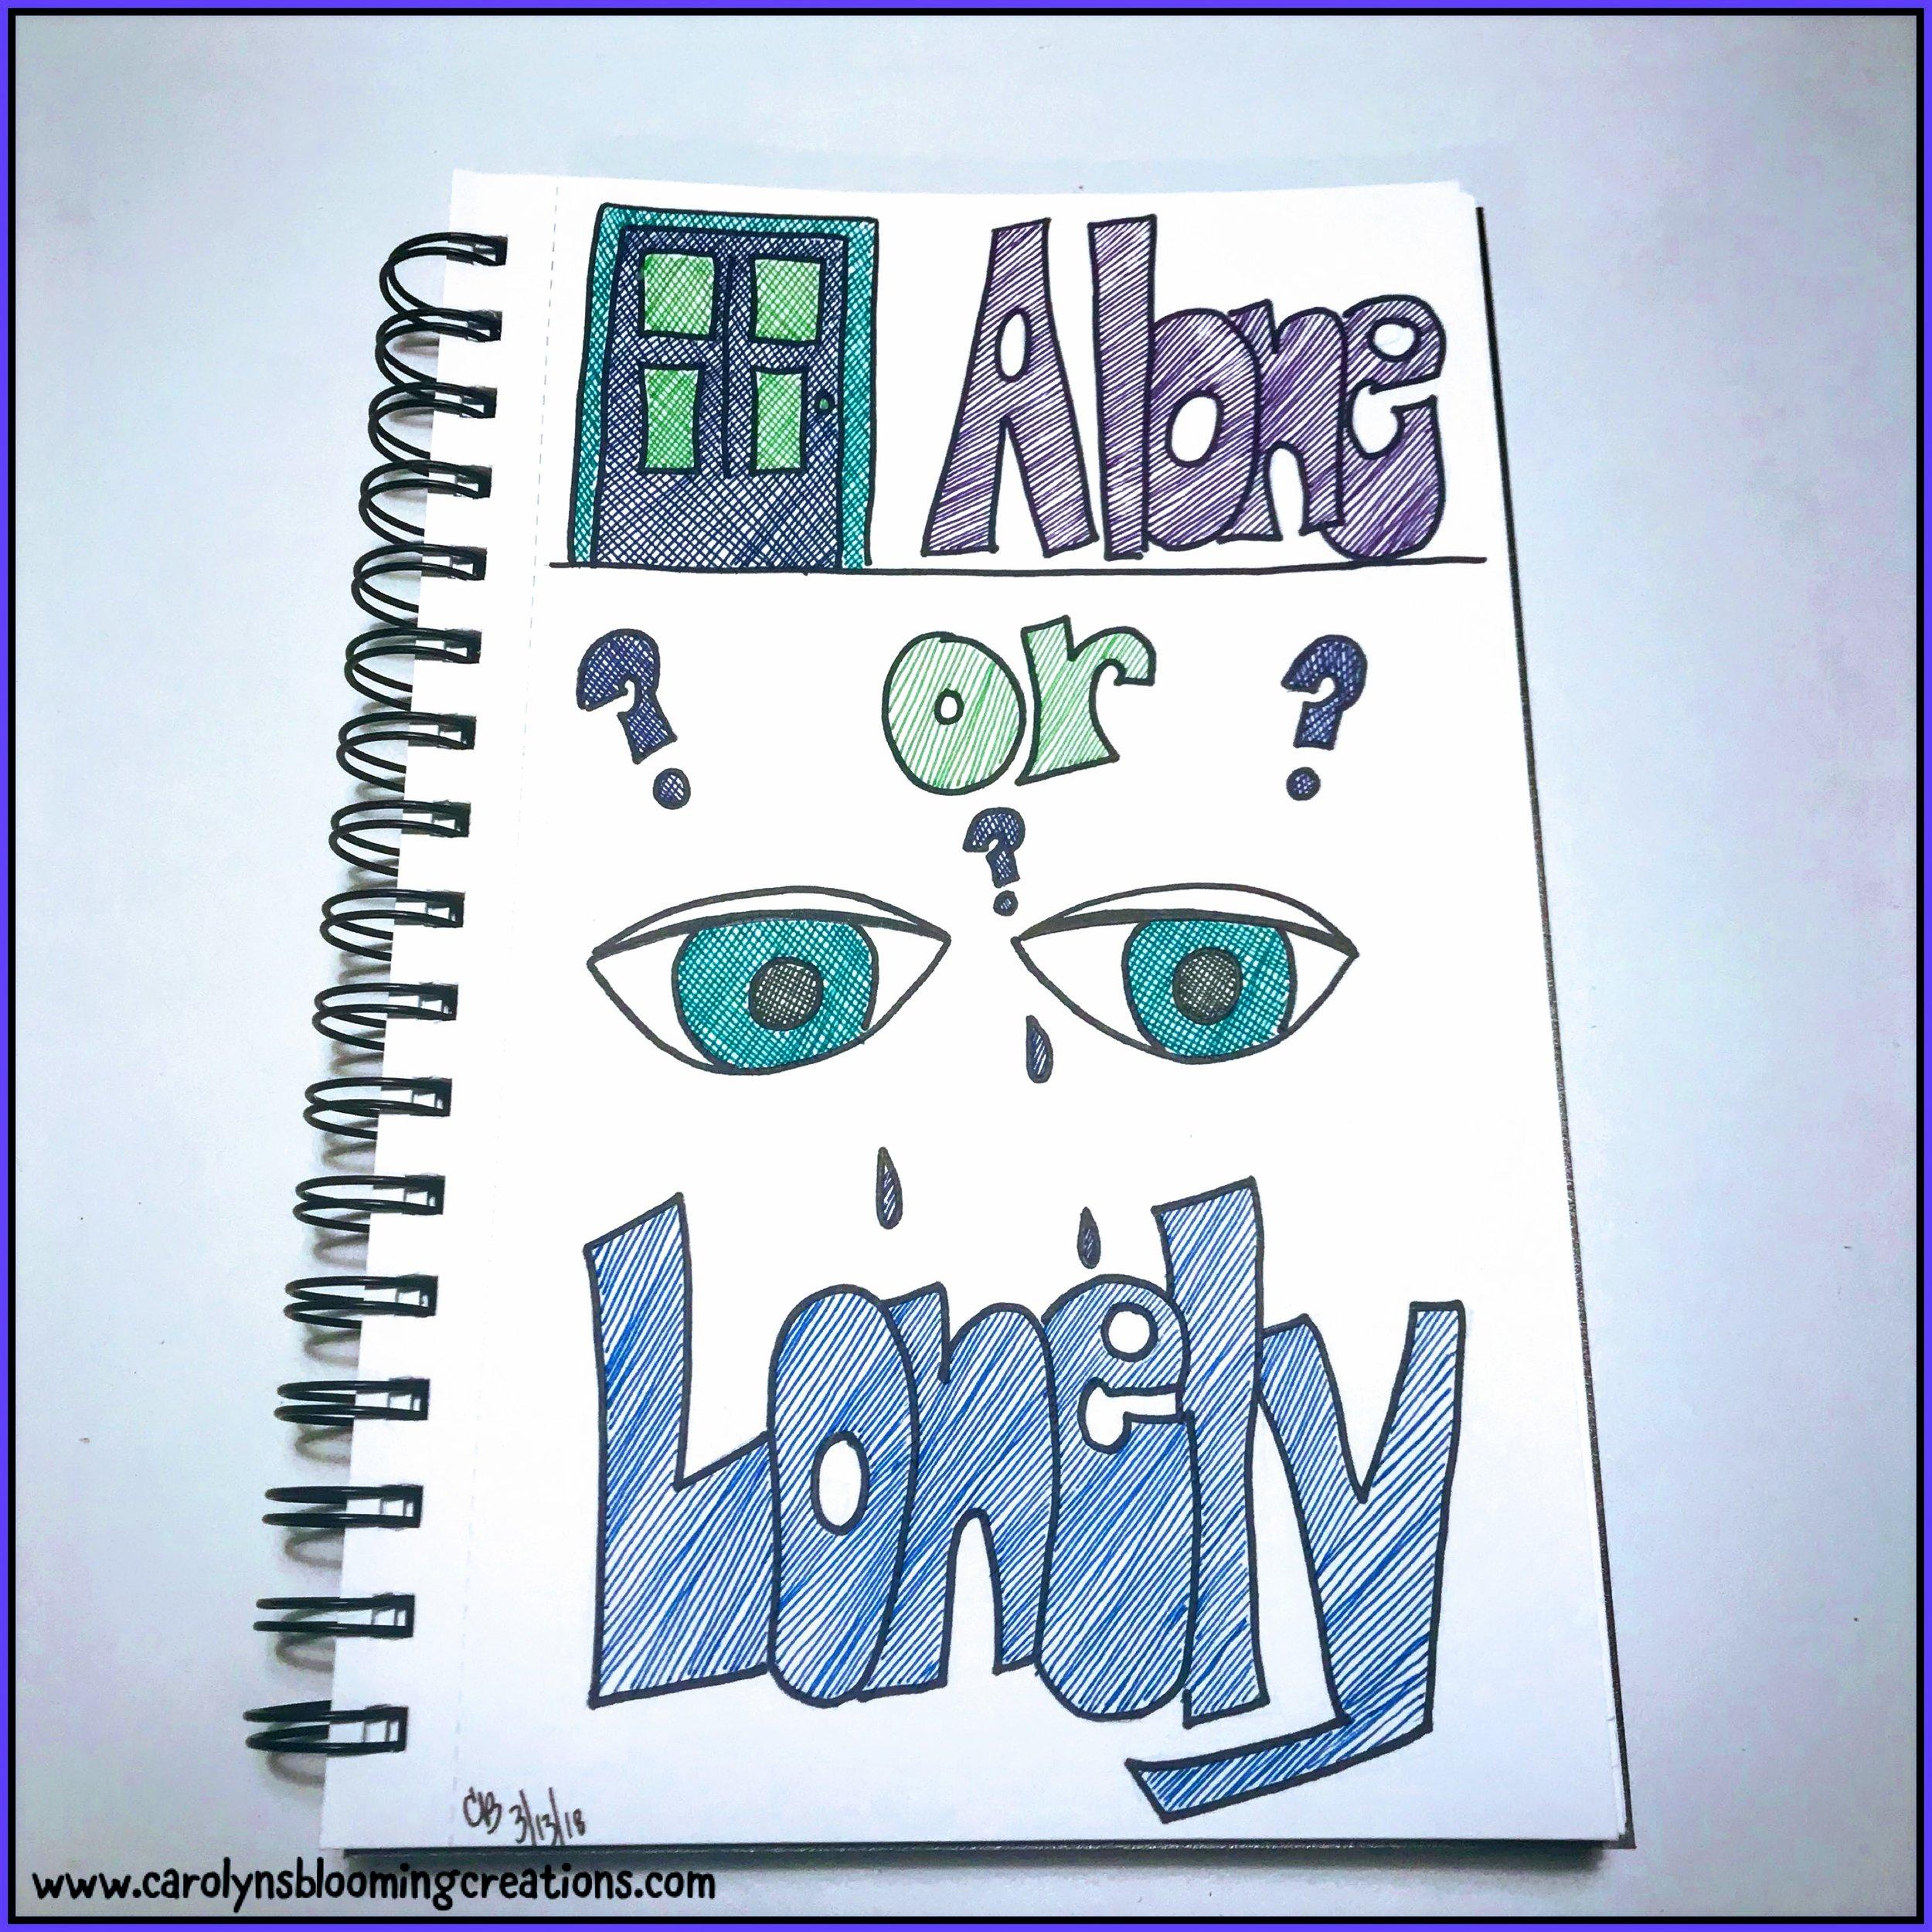 Art by Carolyn J. Braden: Alone or Lonely